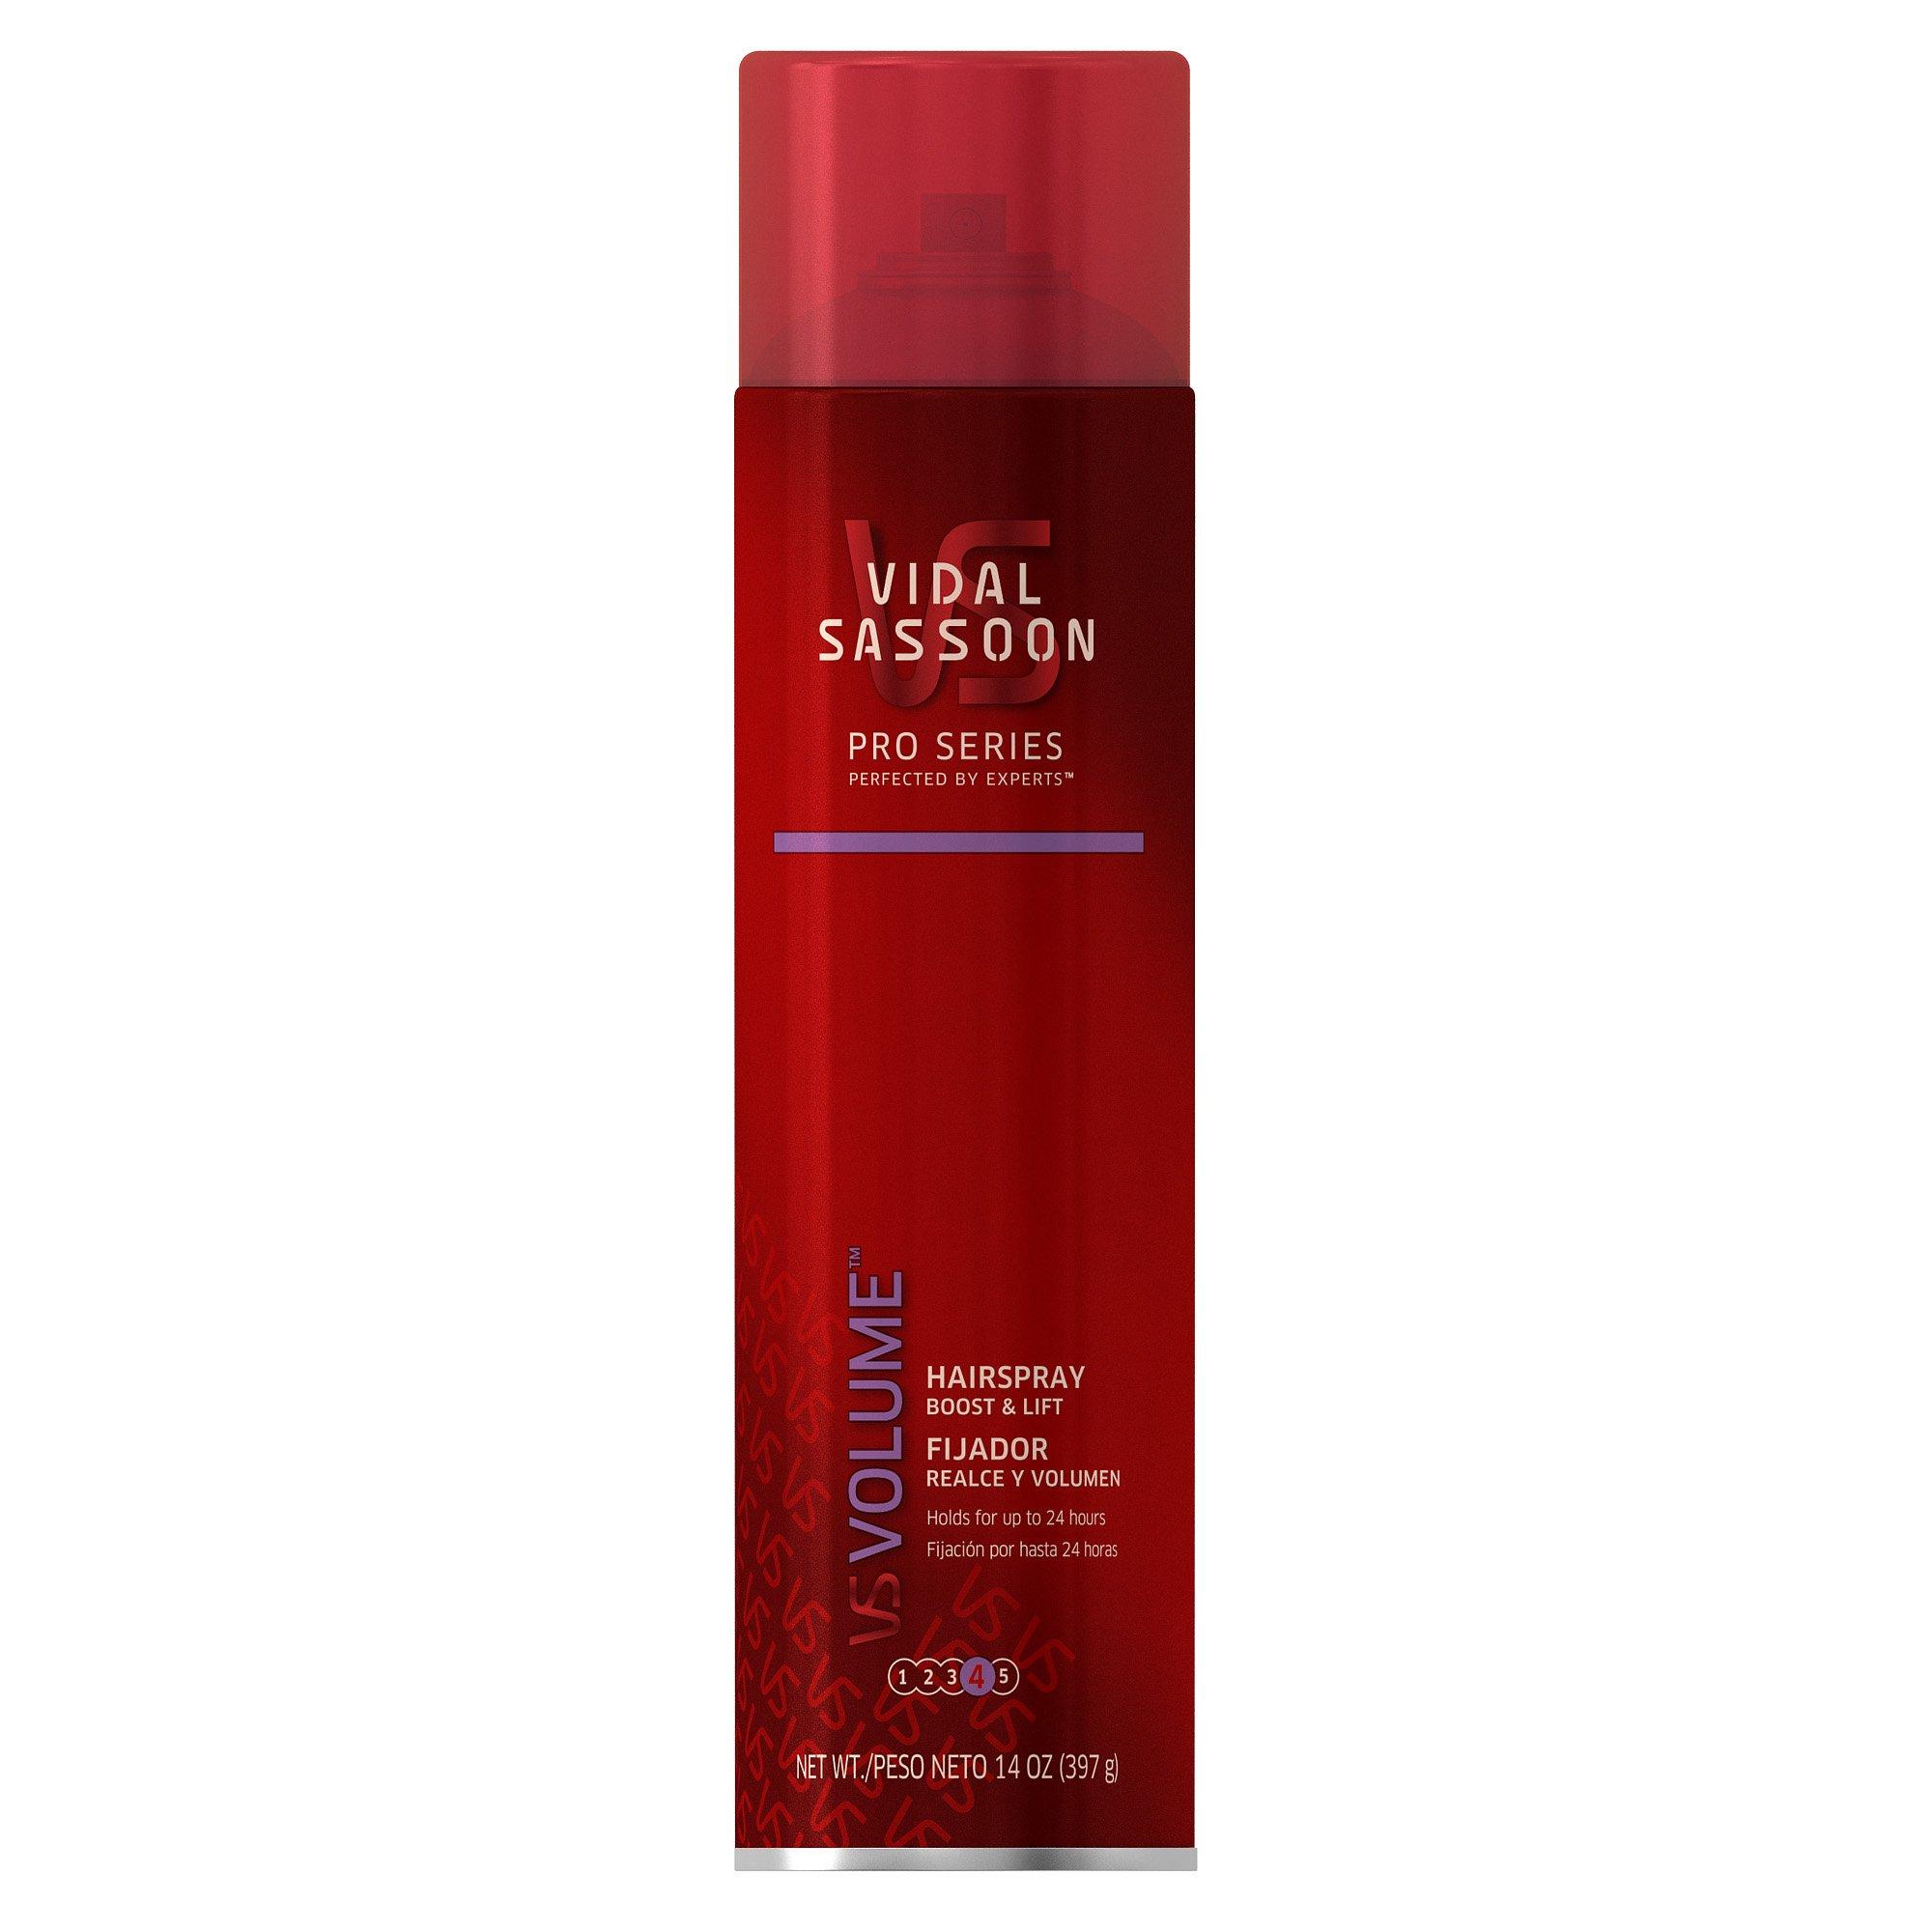 Vidal Sassoon Pro Series Boost & Lift Hair Spray 14 Oz